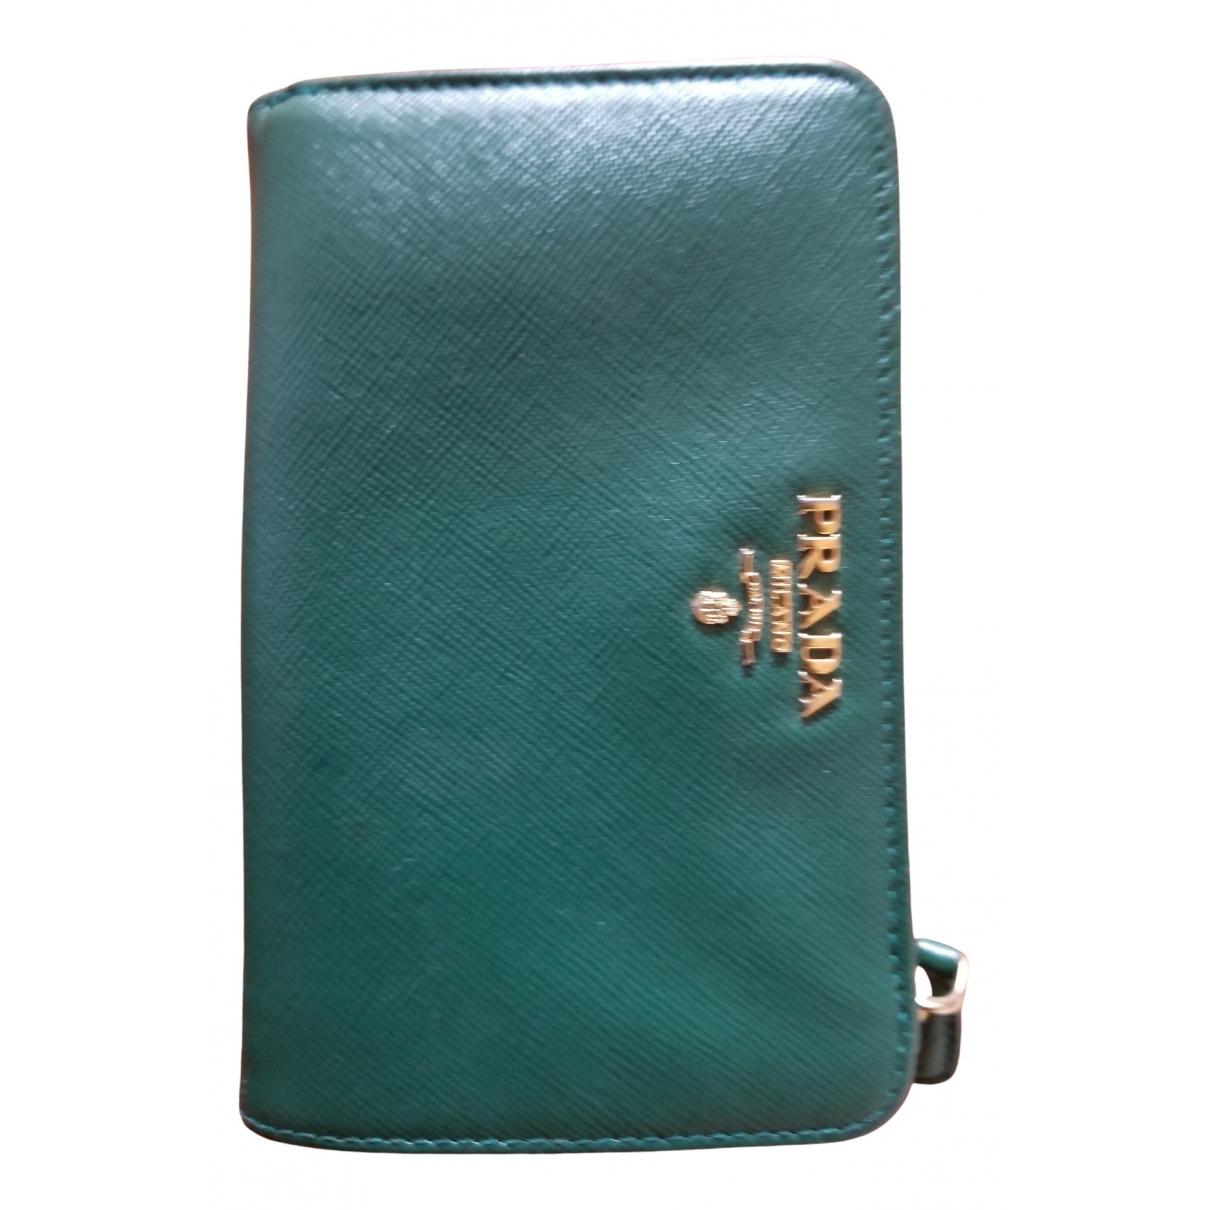 Prada - Portefeuille   pour femme en cuir - vert